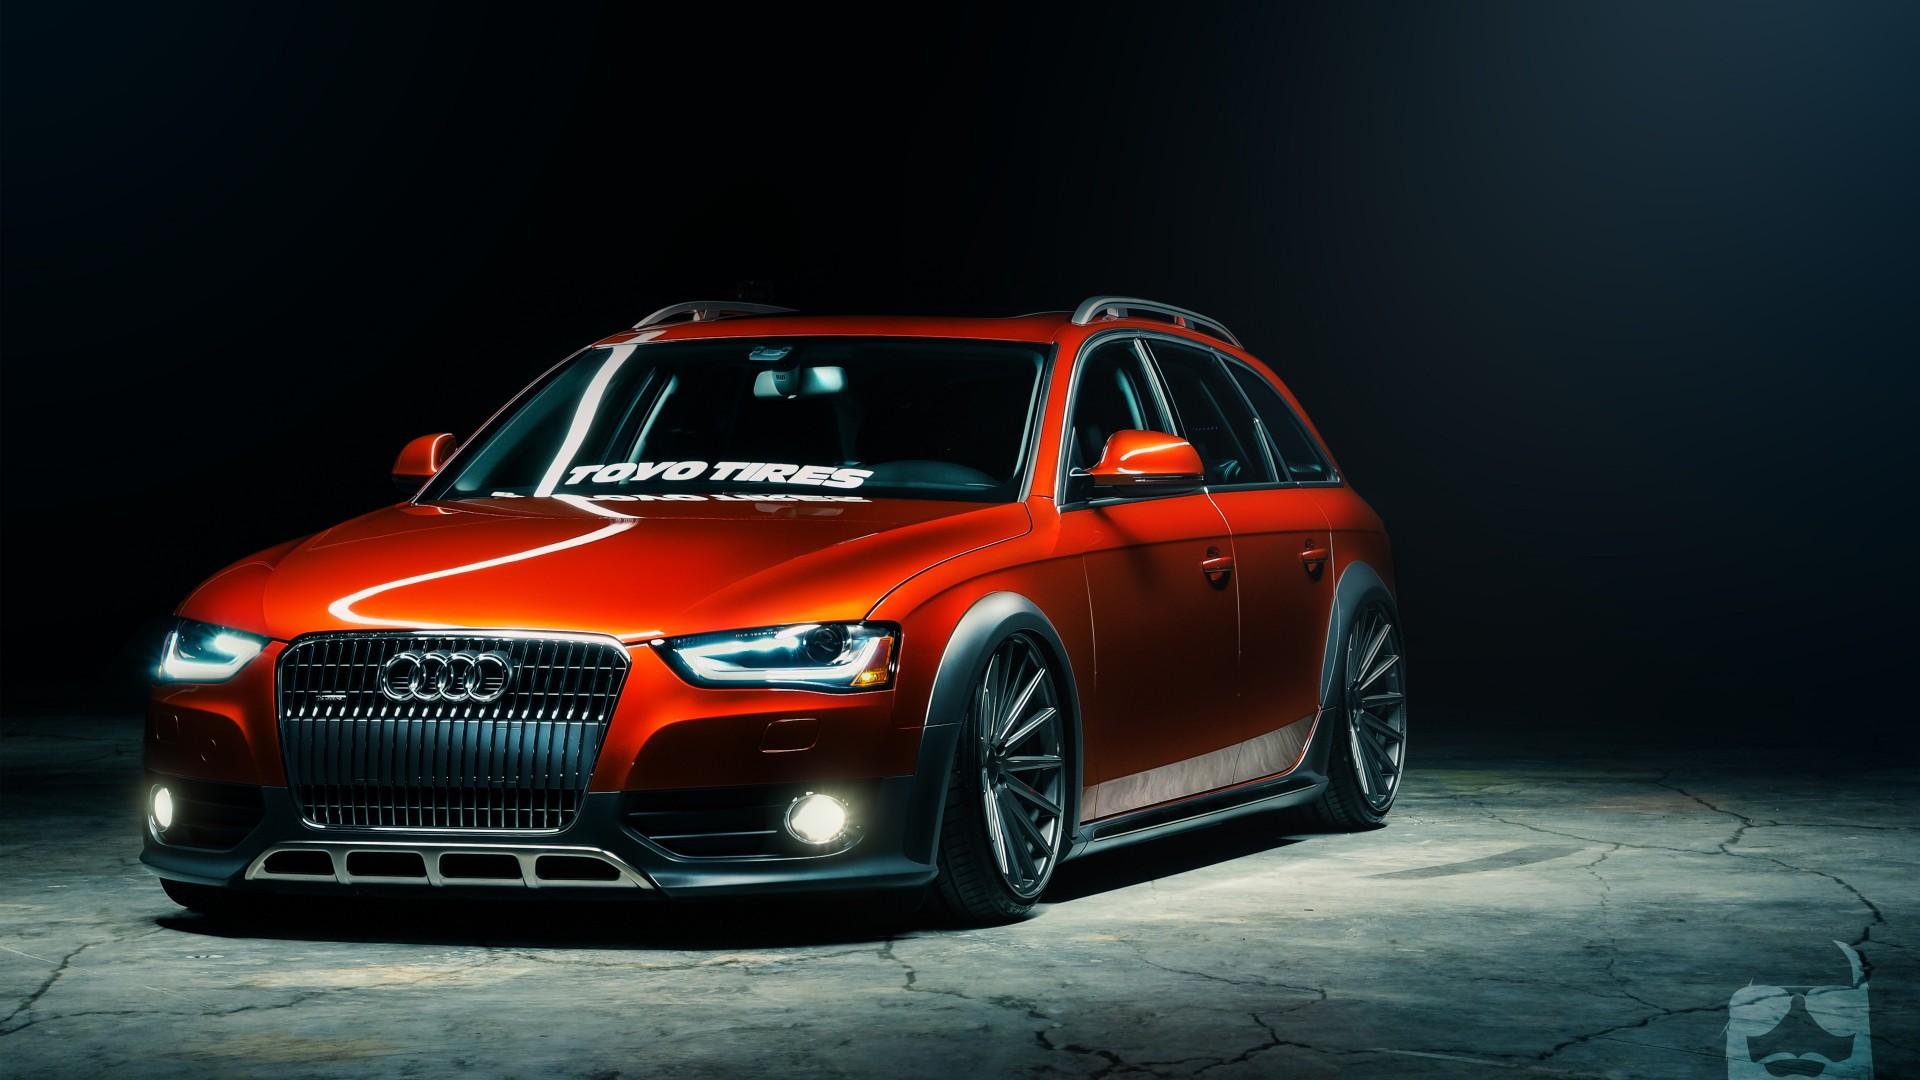 Audi Allroad Wallpaper | HD Car Wallpapers | ID #5511